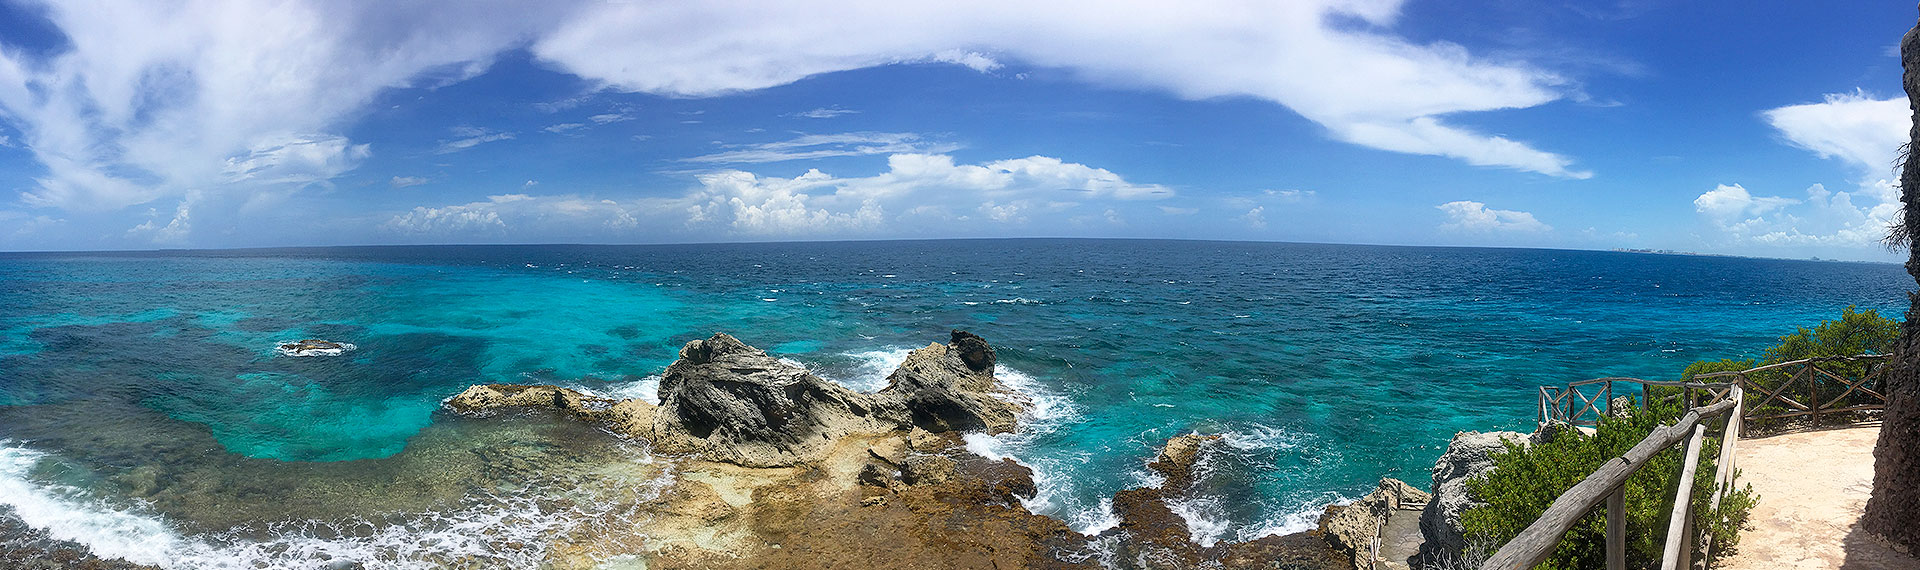 Mayan Goddess Ixchel, Isla Mujeres, history of Isla Mujeres, Mexican Caribbean, ferry terminal on Isla Mujeres, beautiful beaches